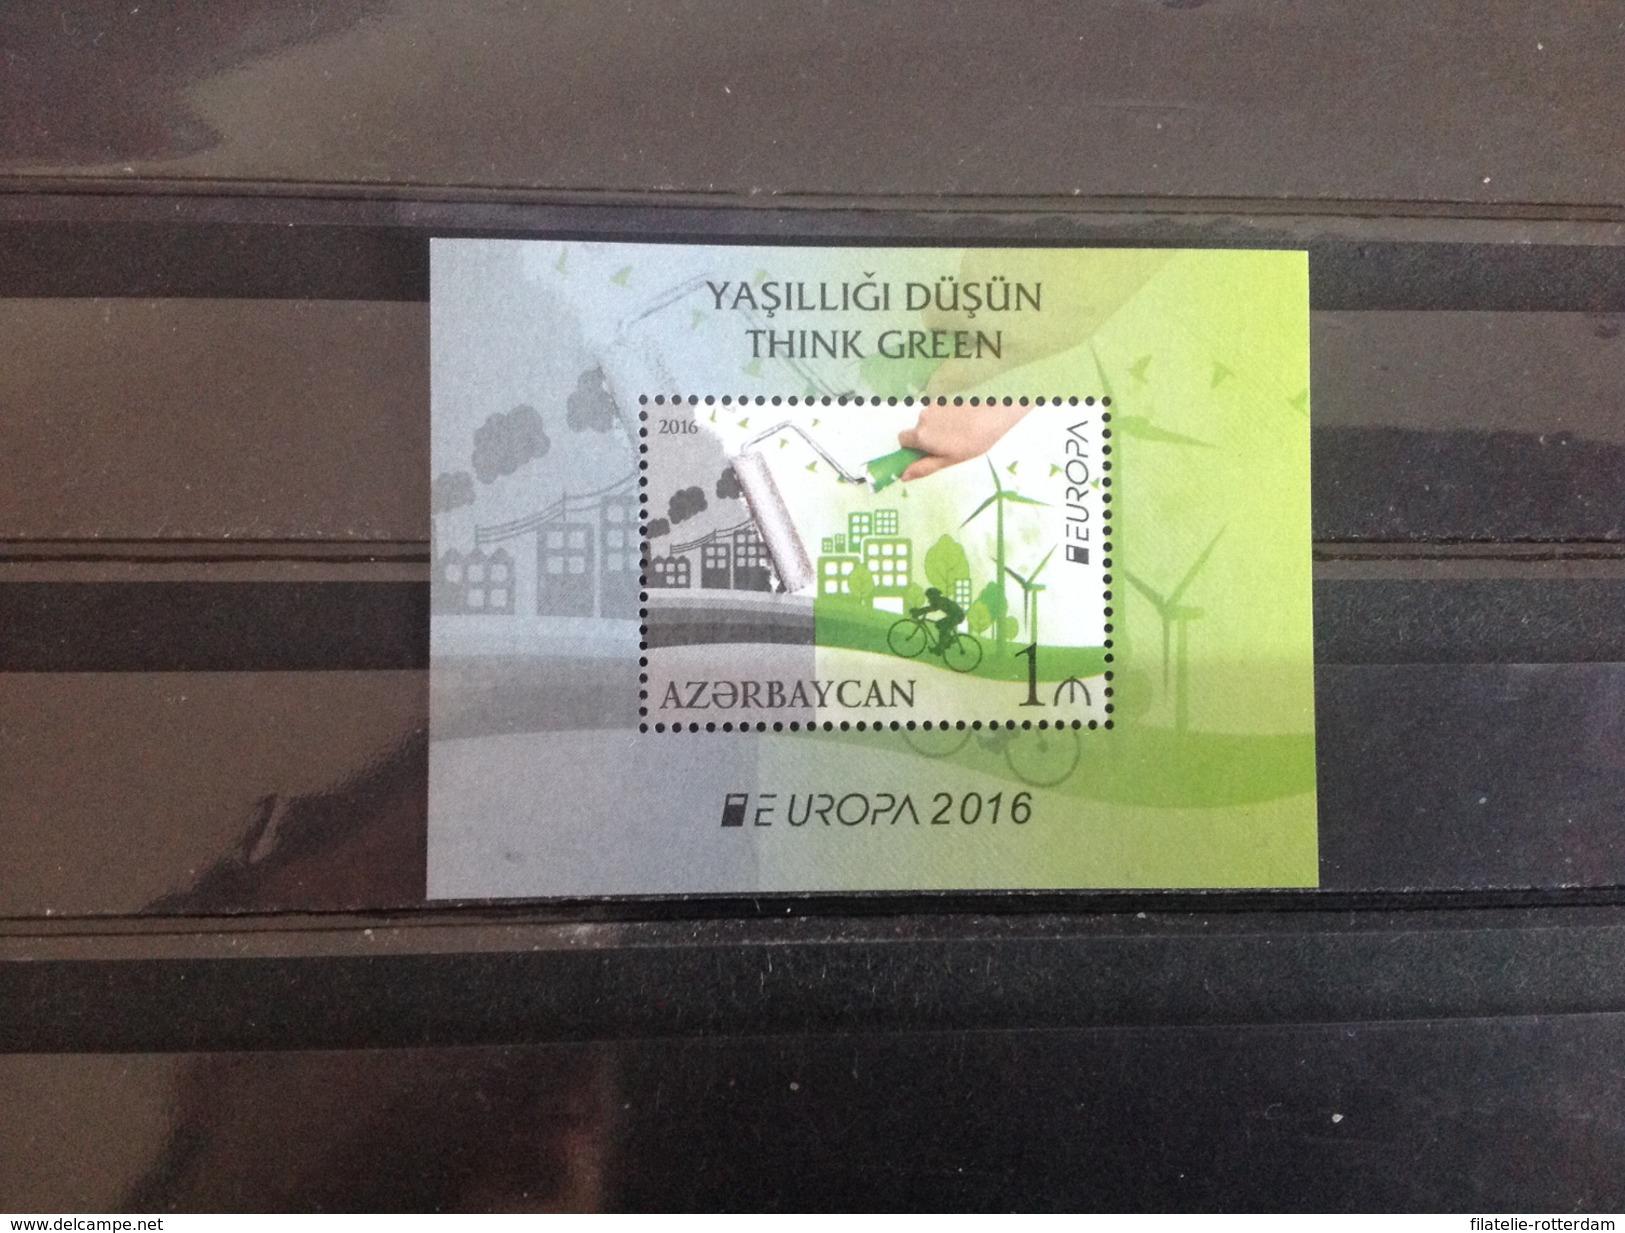 Azerbaijan - Postfris / MNH - Sheet Europa, Denk Groen 2016 NEW! Very Rare! - Azerbeidzjan